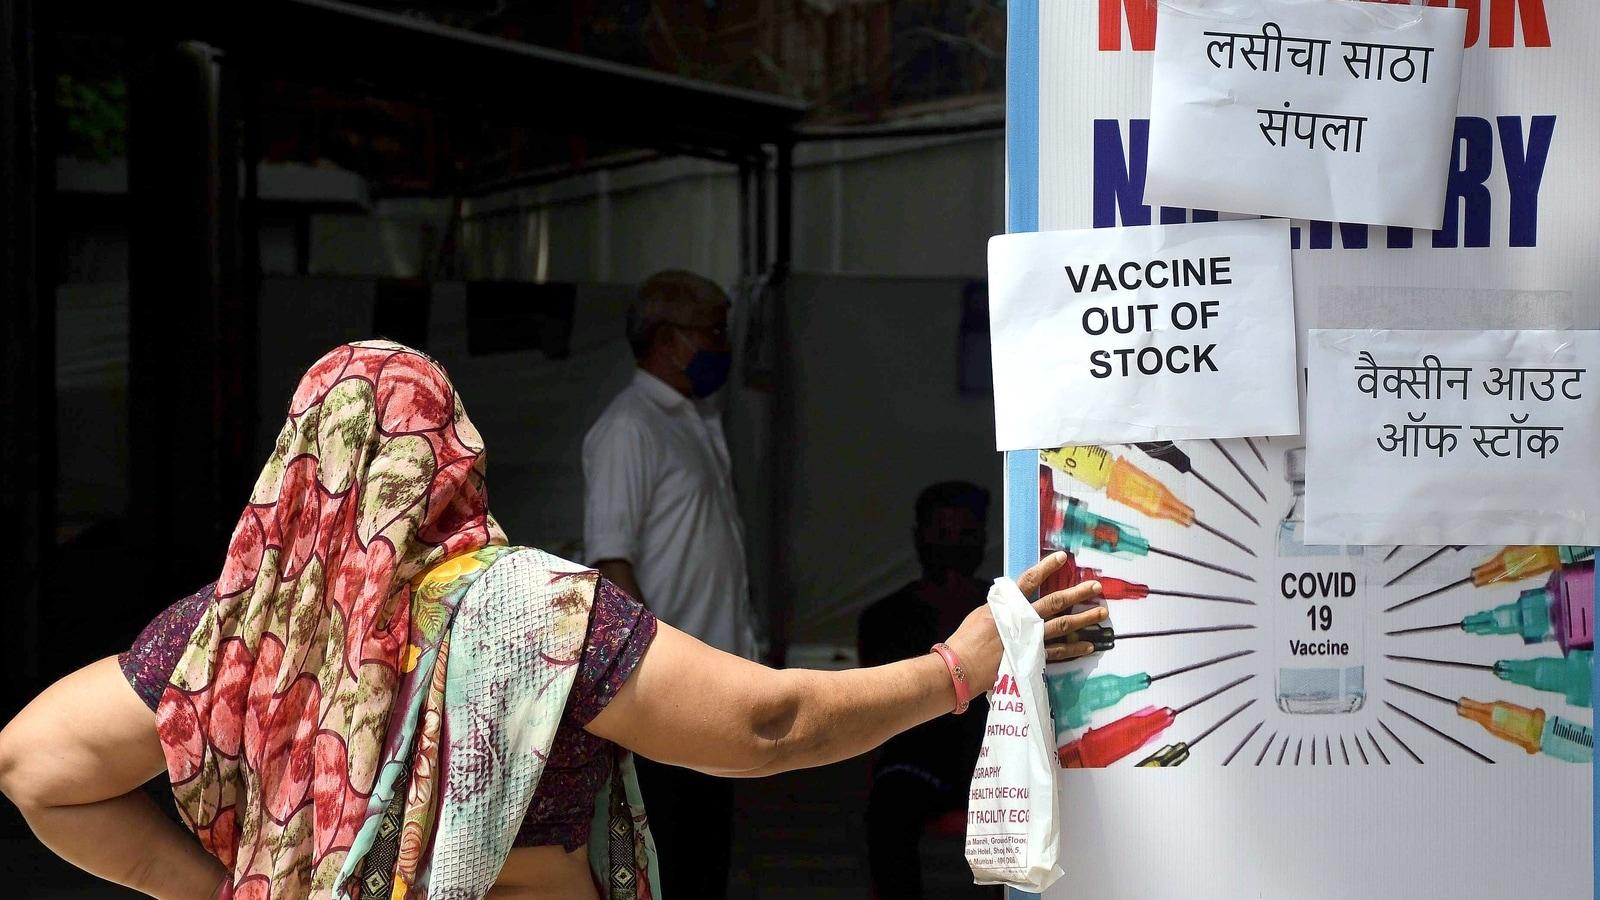 Covid-19 Mumbai's private vaccine centers closed until April 12, BMC apologizes for inconvenience